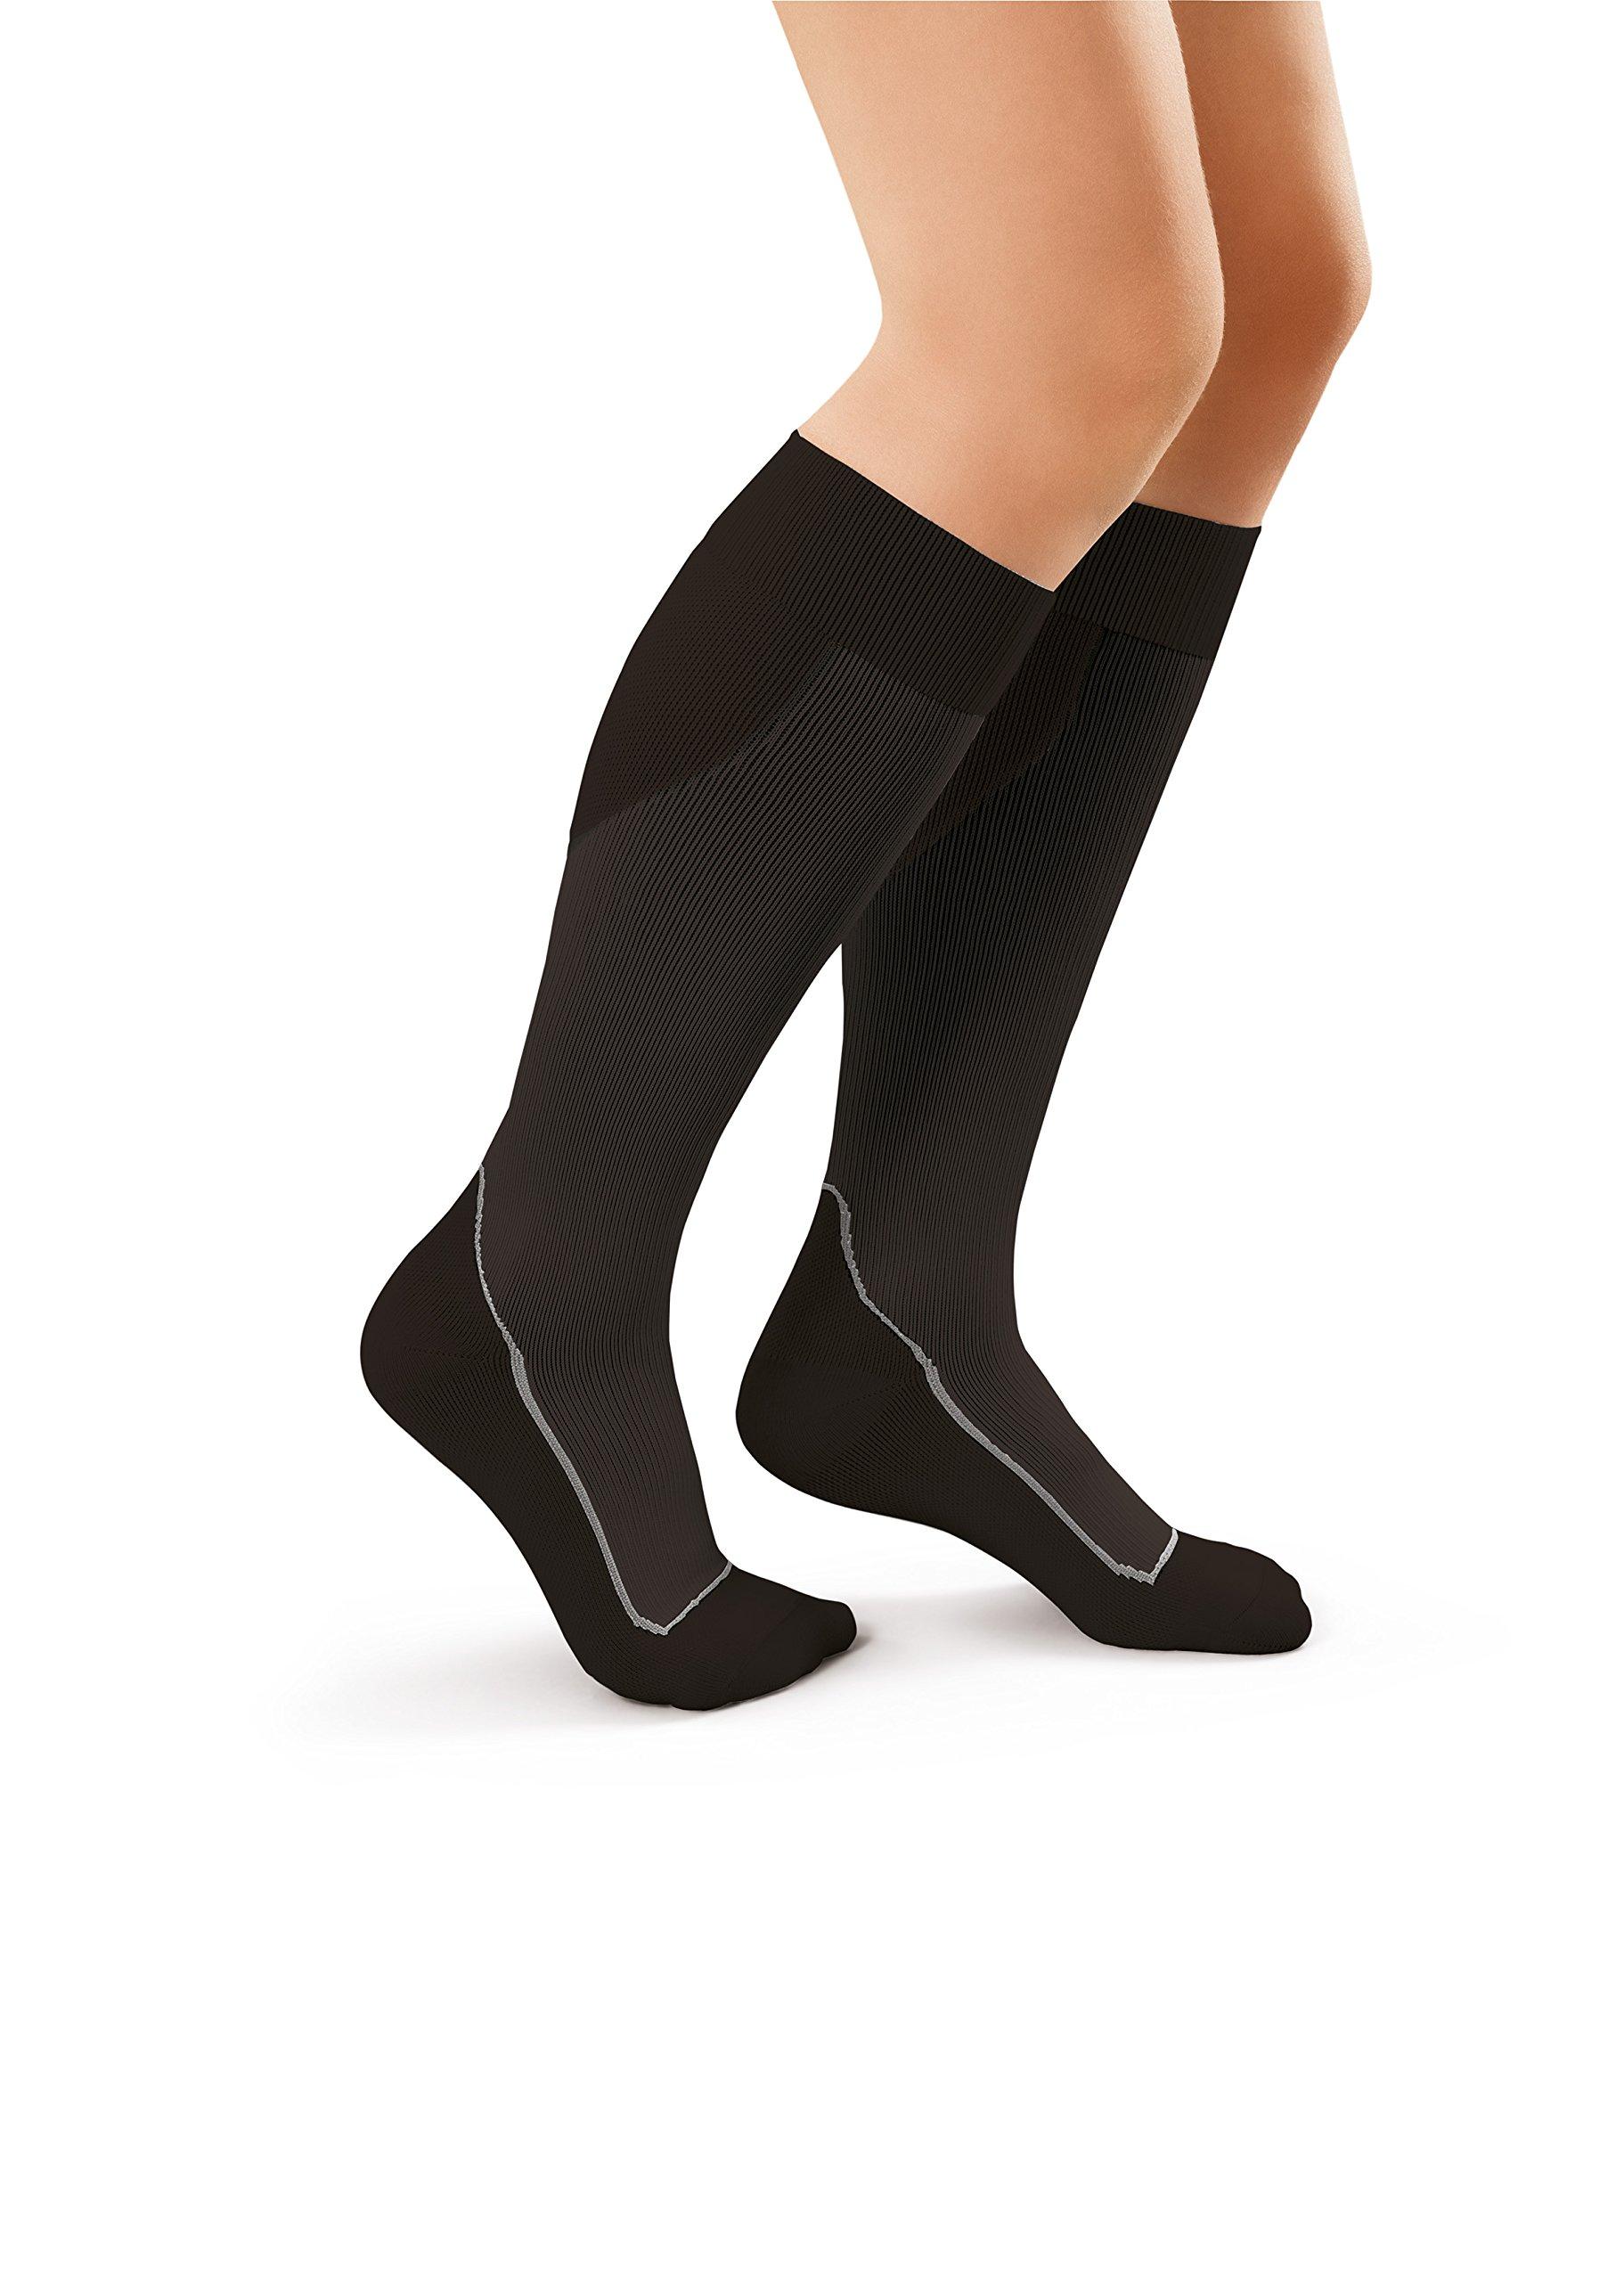 Amazon.com: JOBST Sport Knee High 15-20 mmHg Compression Socks, Black/Cool Black, X-Large: Health & Personal Care